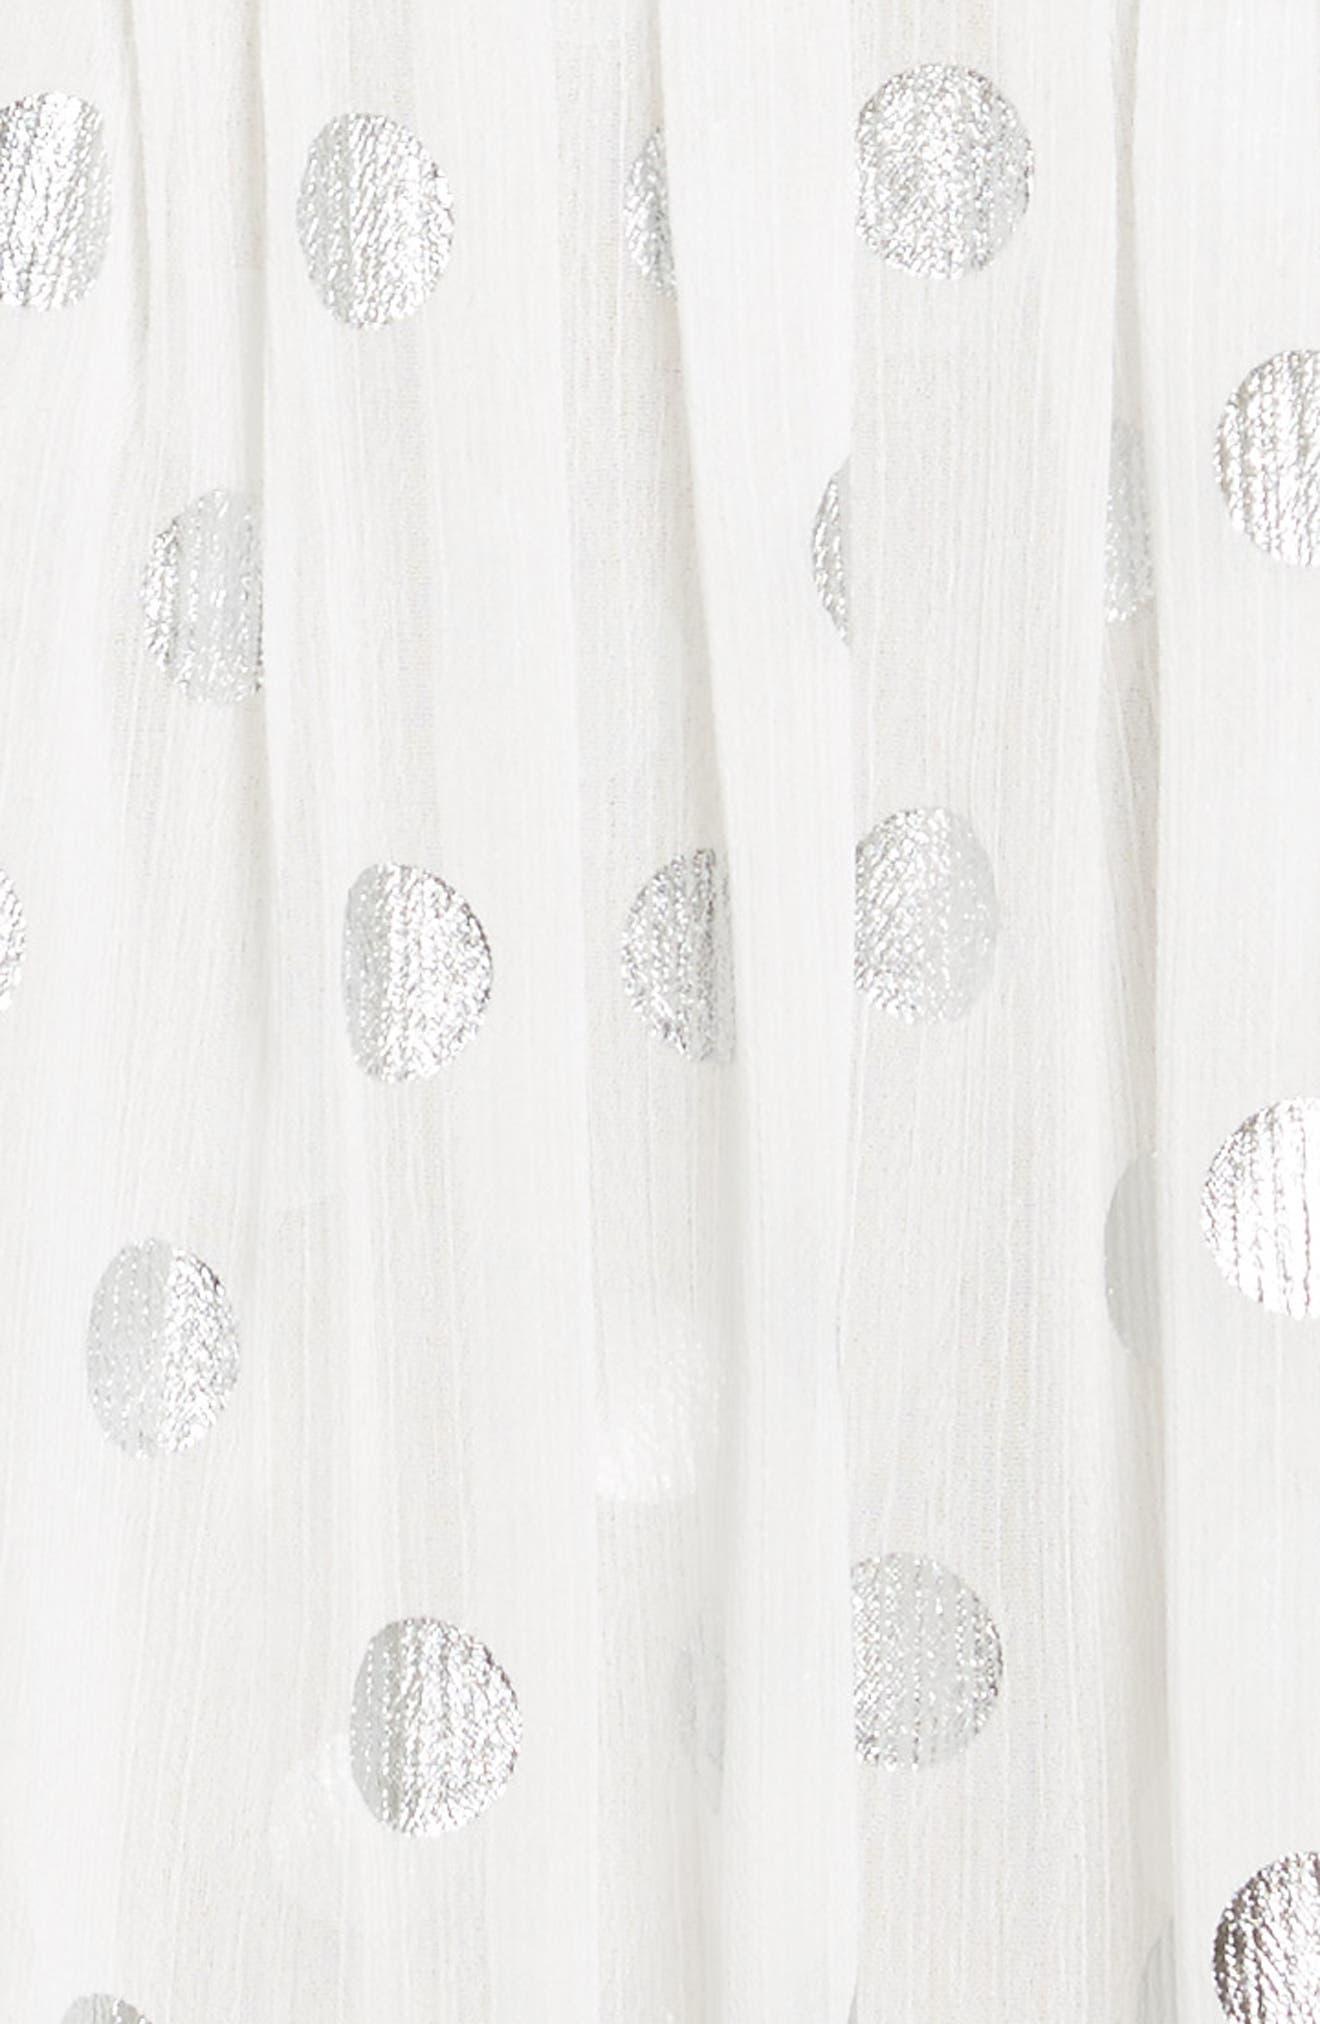 Asymmetric Gathered Short Sleeve Dress,                             Alternate thumbnail 5, color,                             110